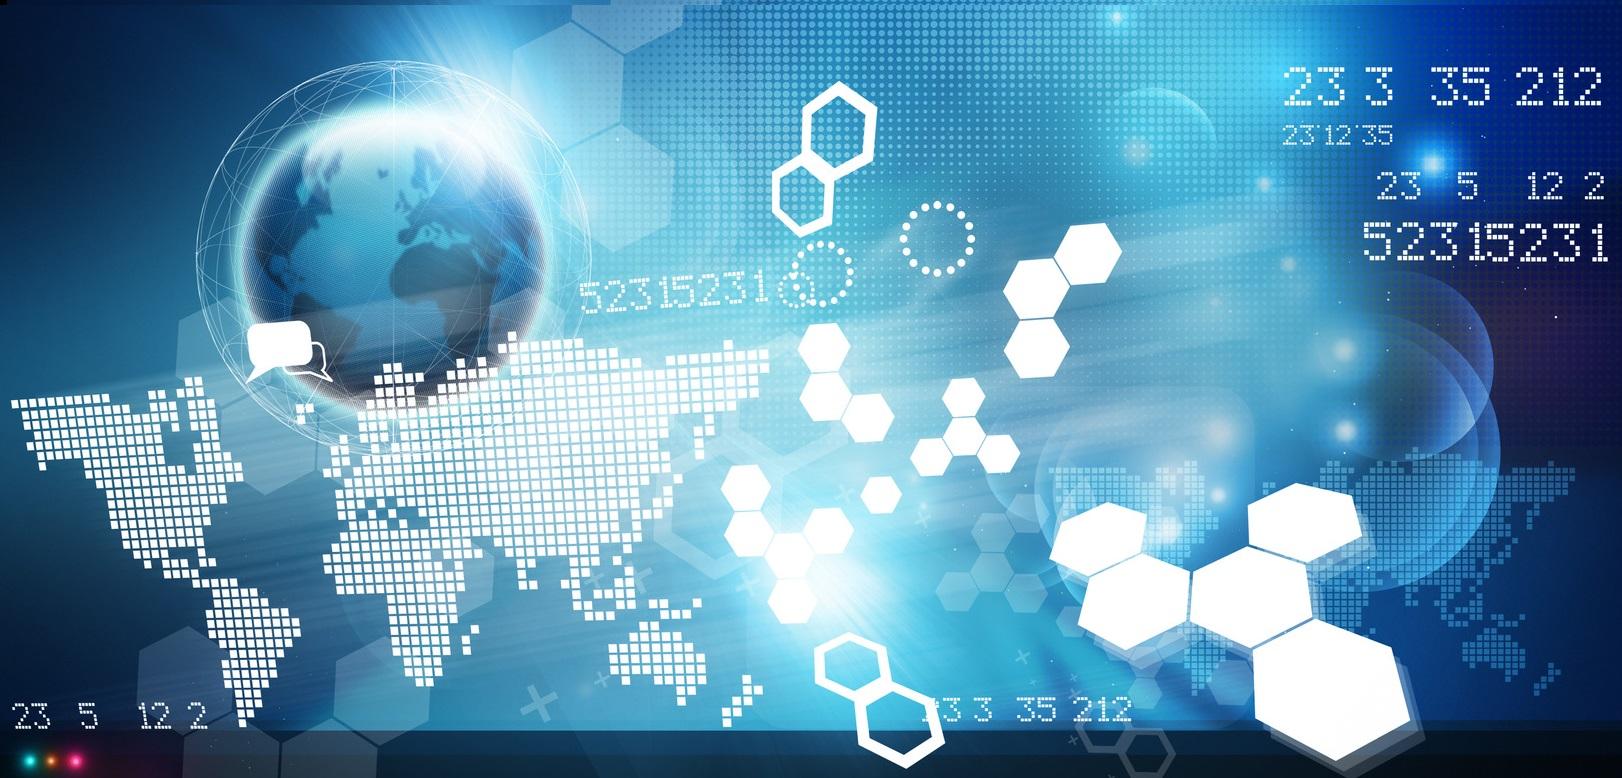 world-technology-background_2.jpg